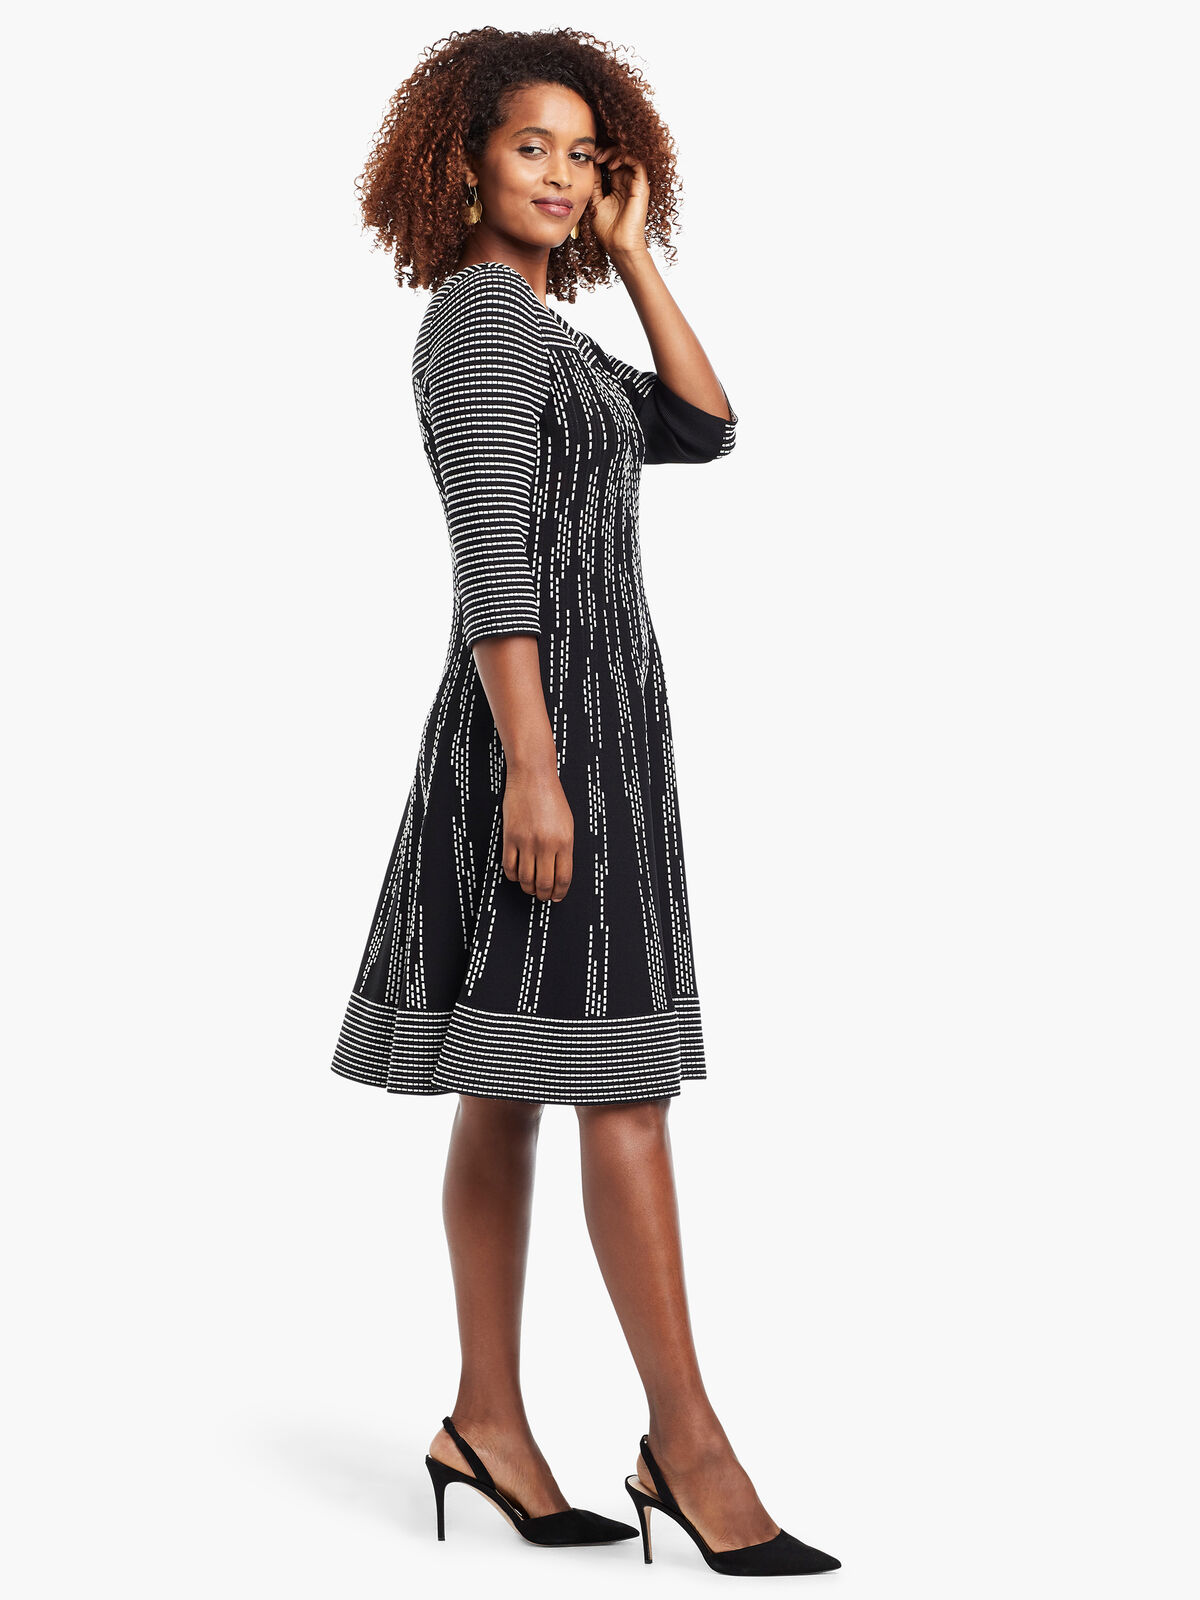 Dashing Out Twirl Dress